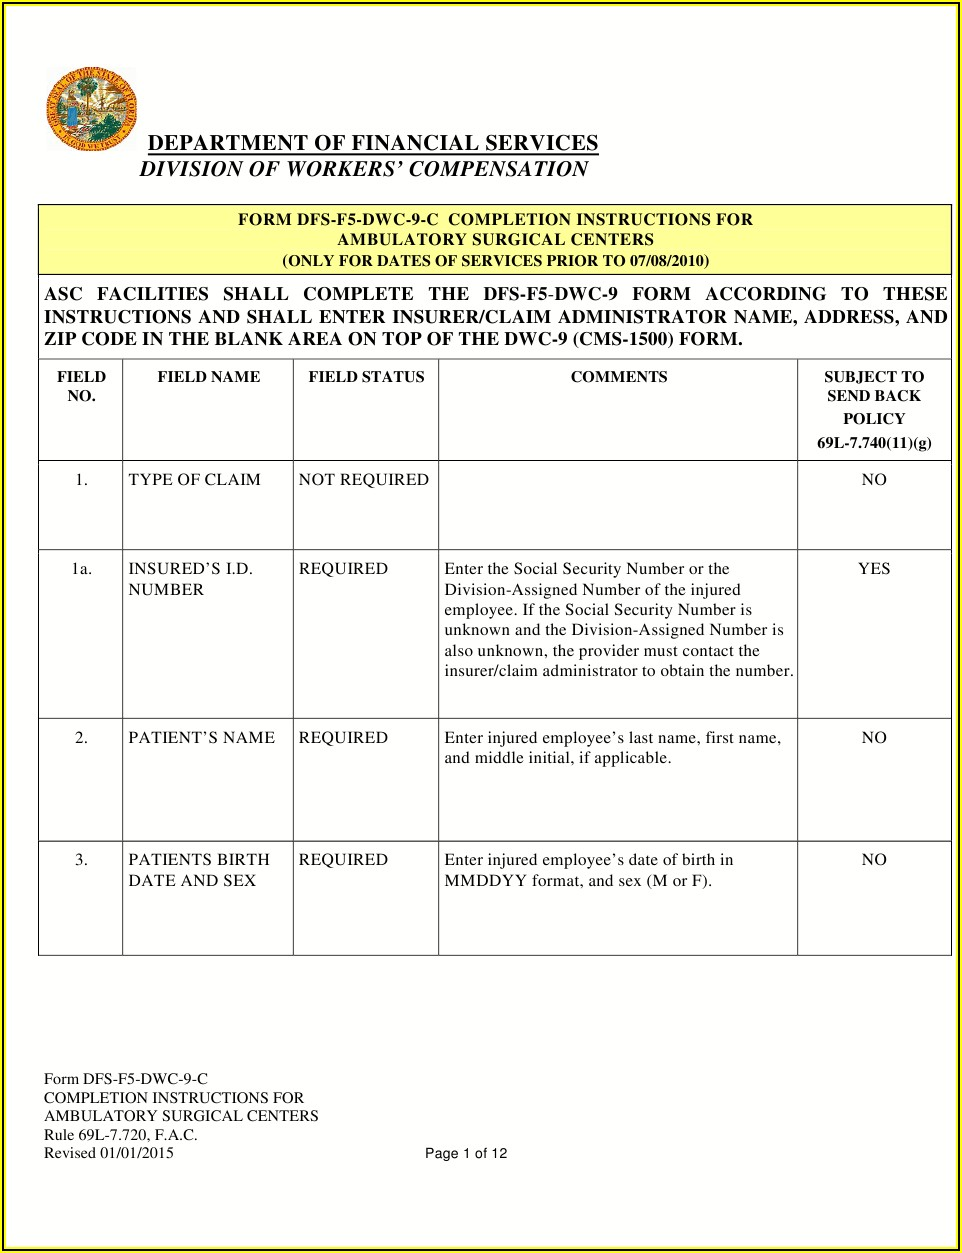 Health Insurance Claim Form Cms 1500 Instructions